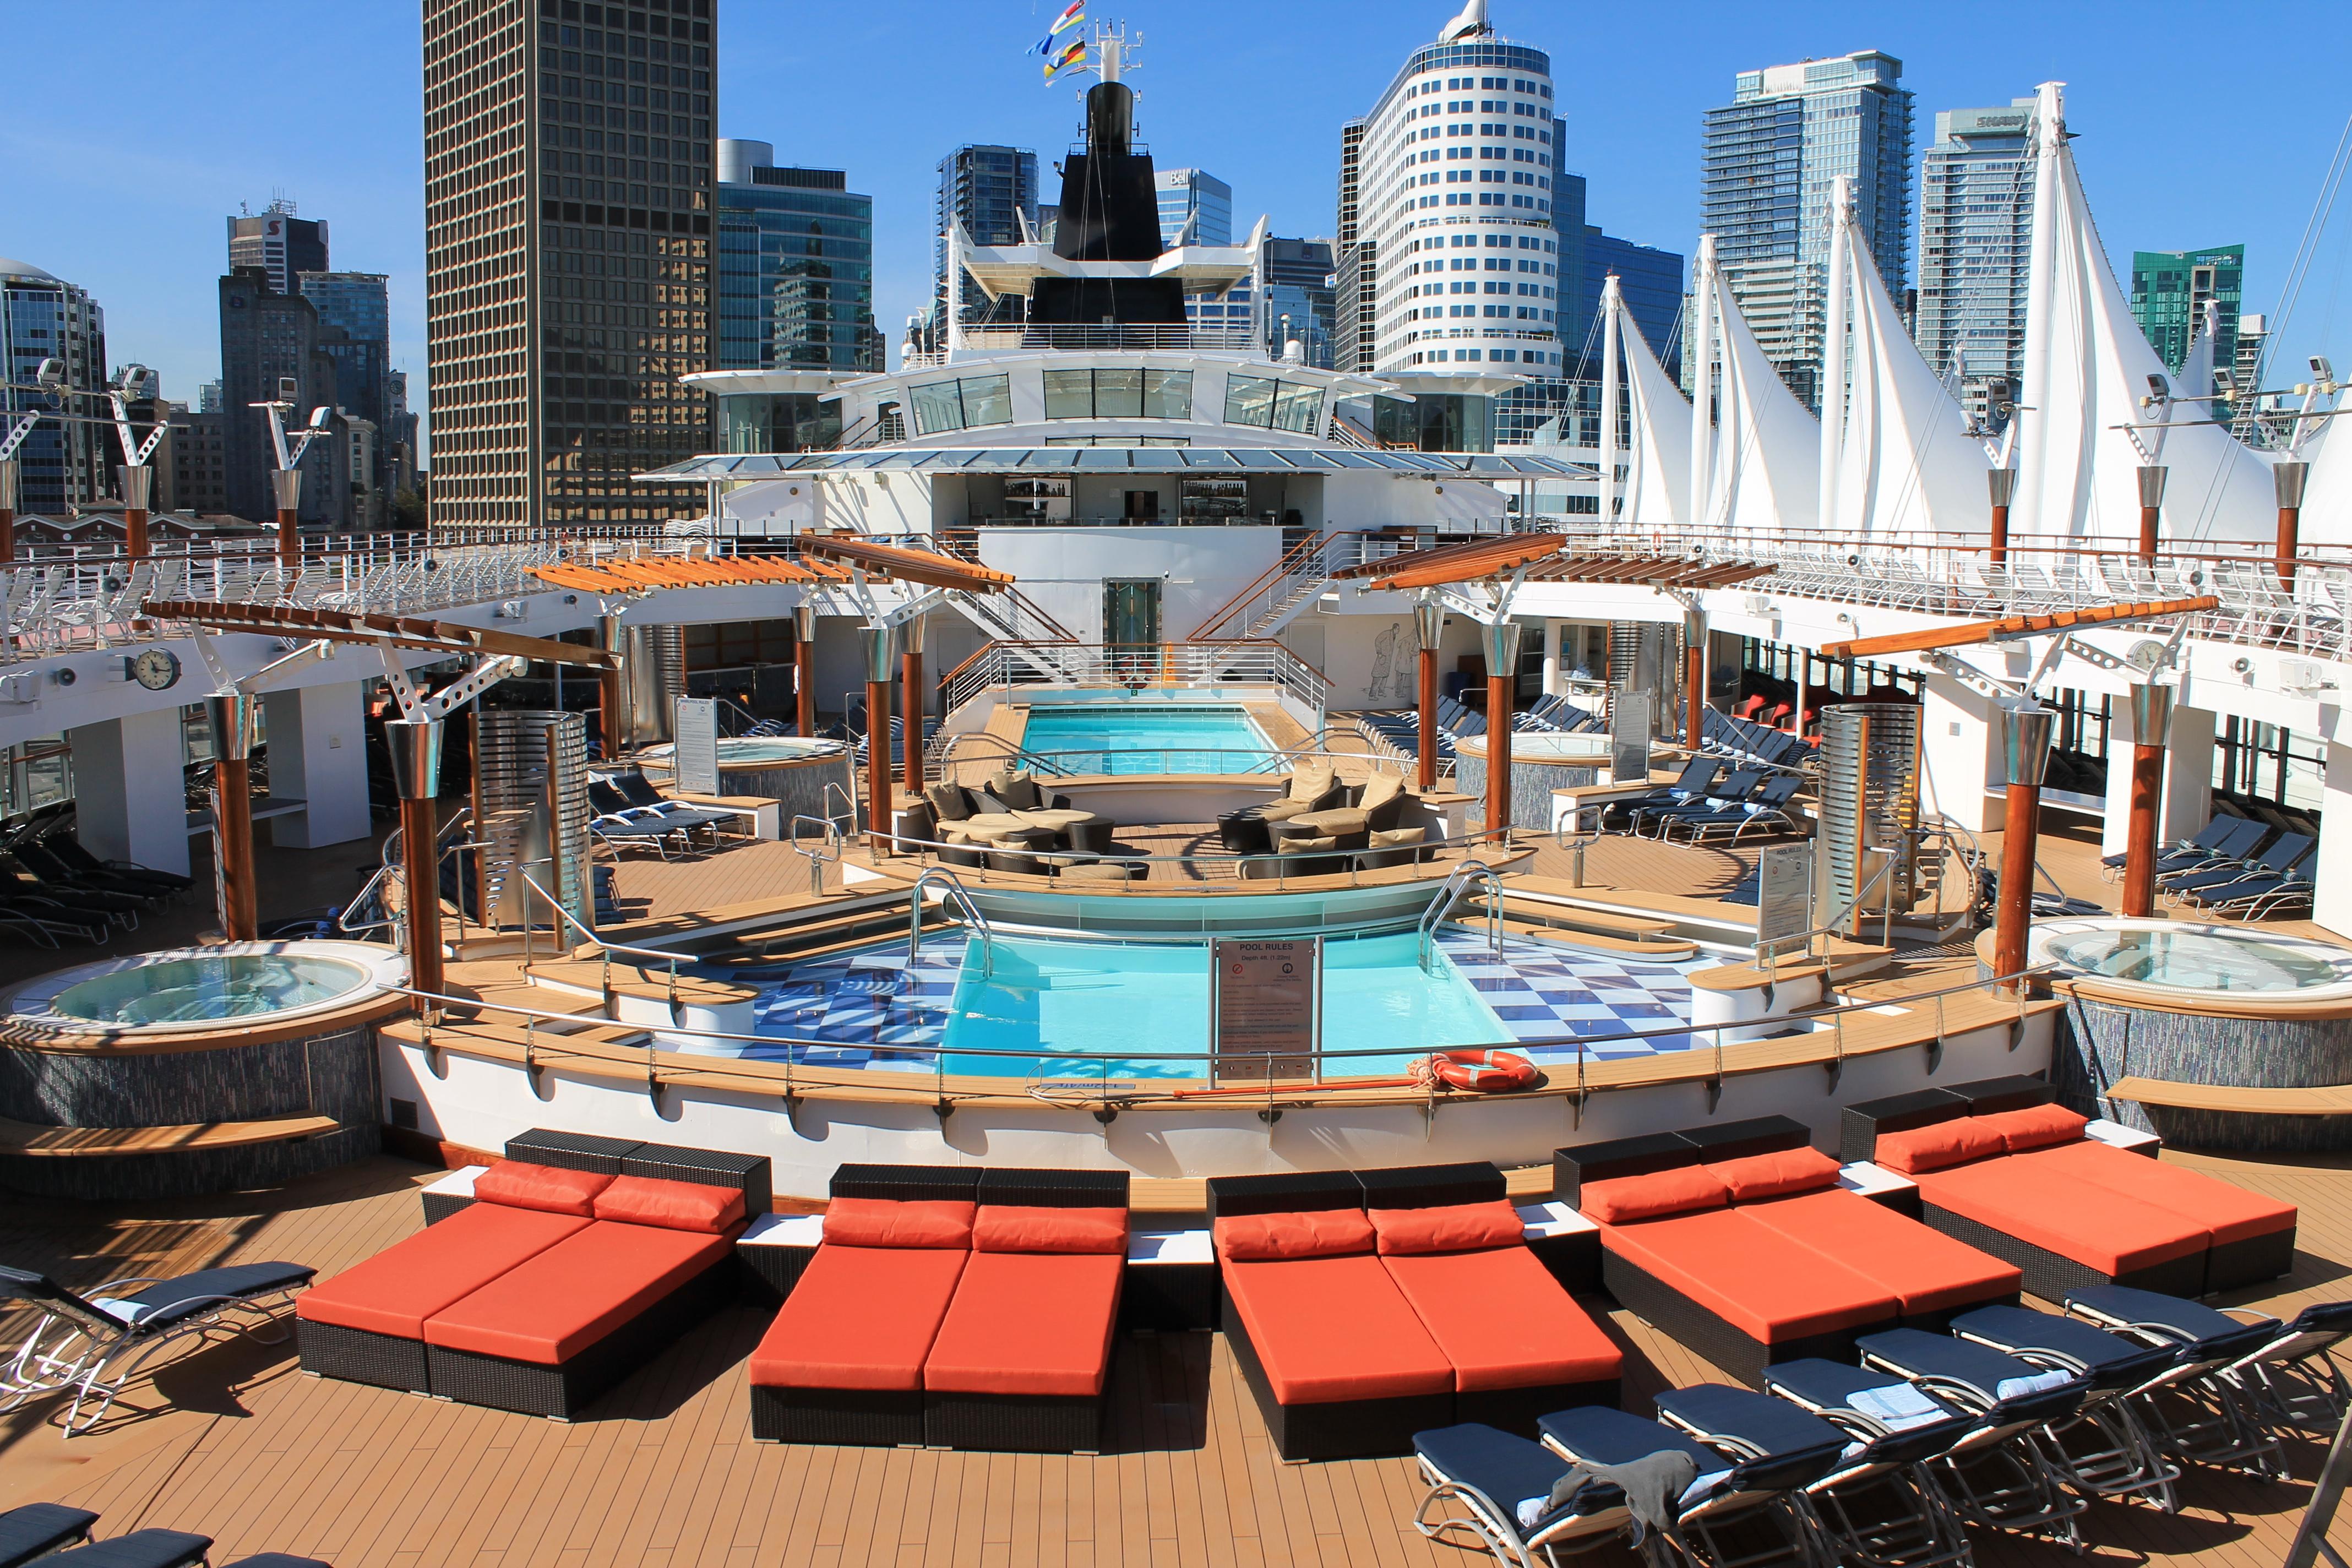 Celebrity Millennium Pictures | U.S. News Best Cruises